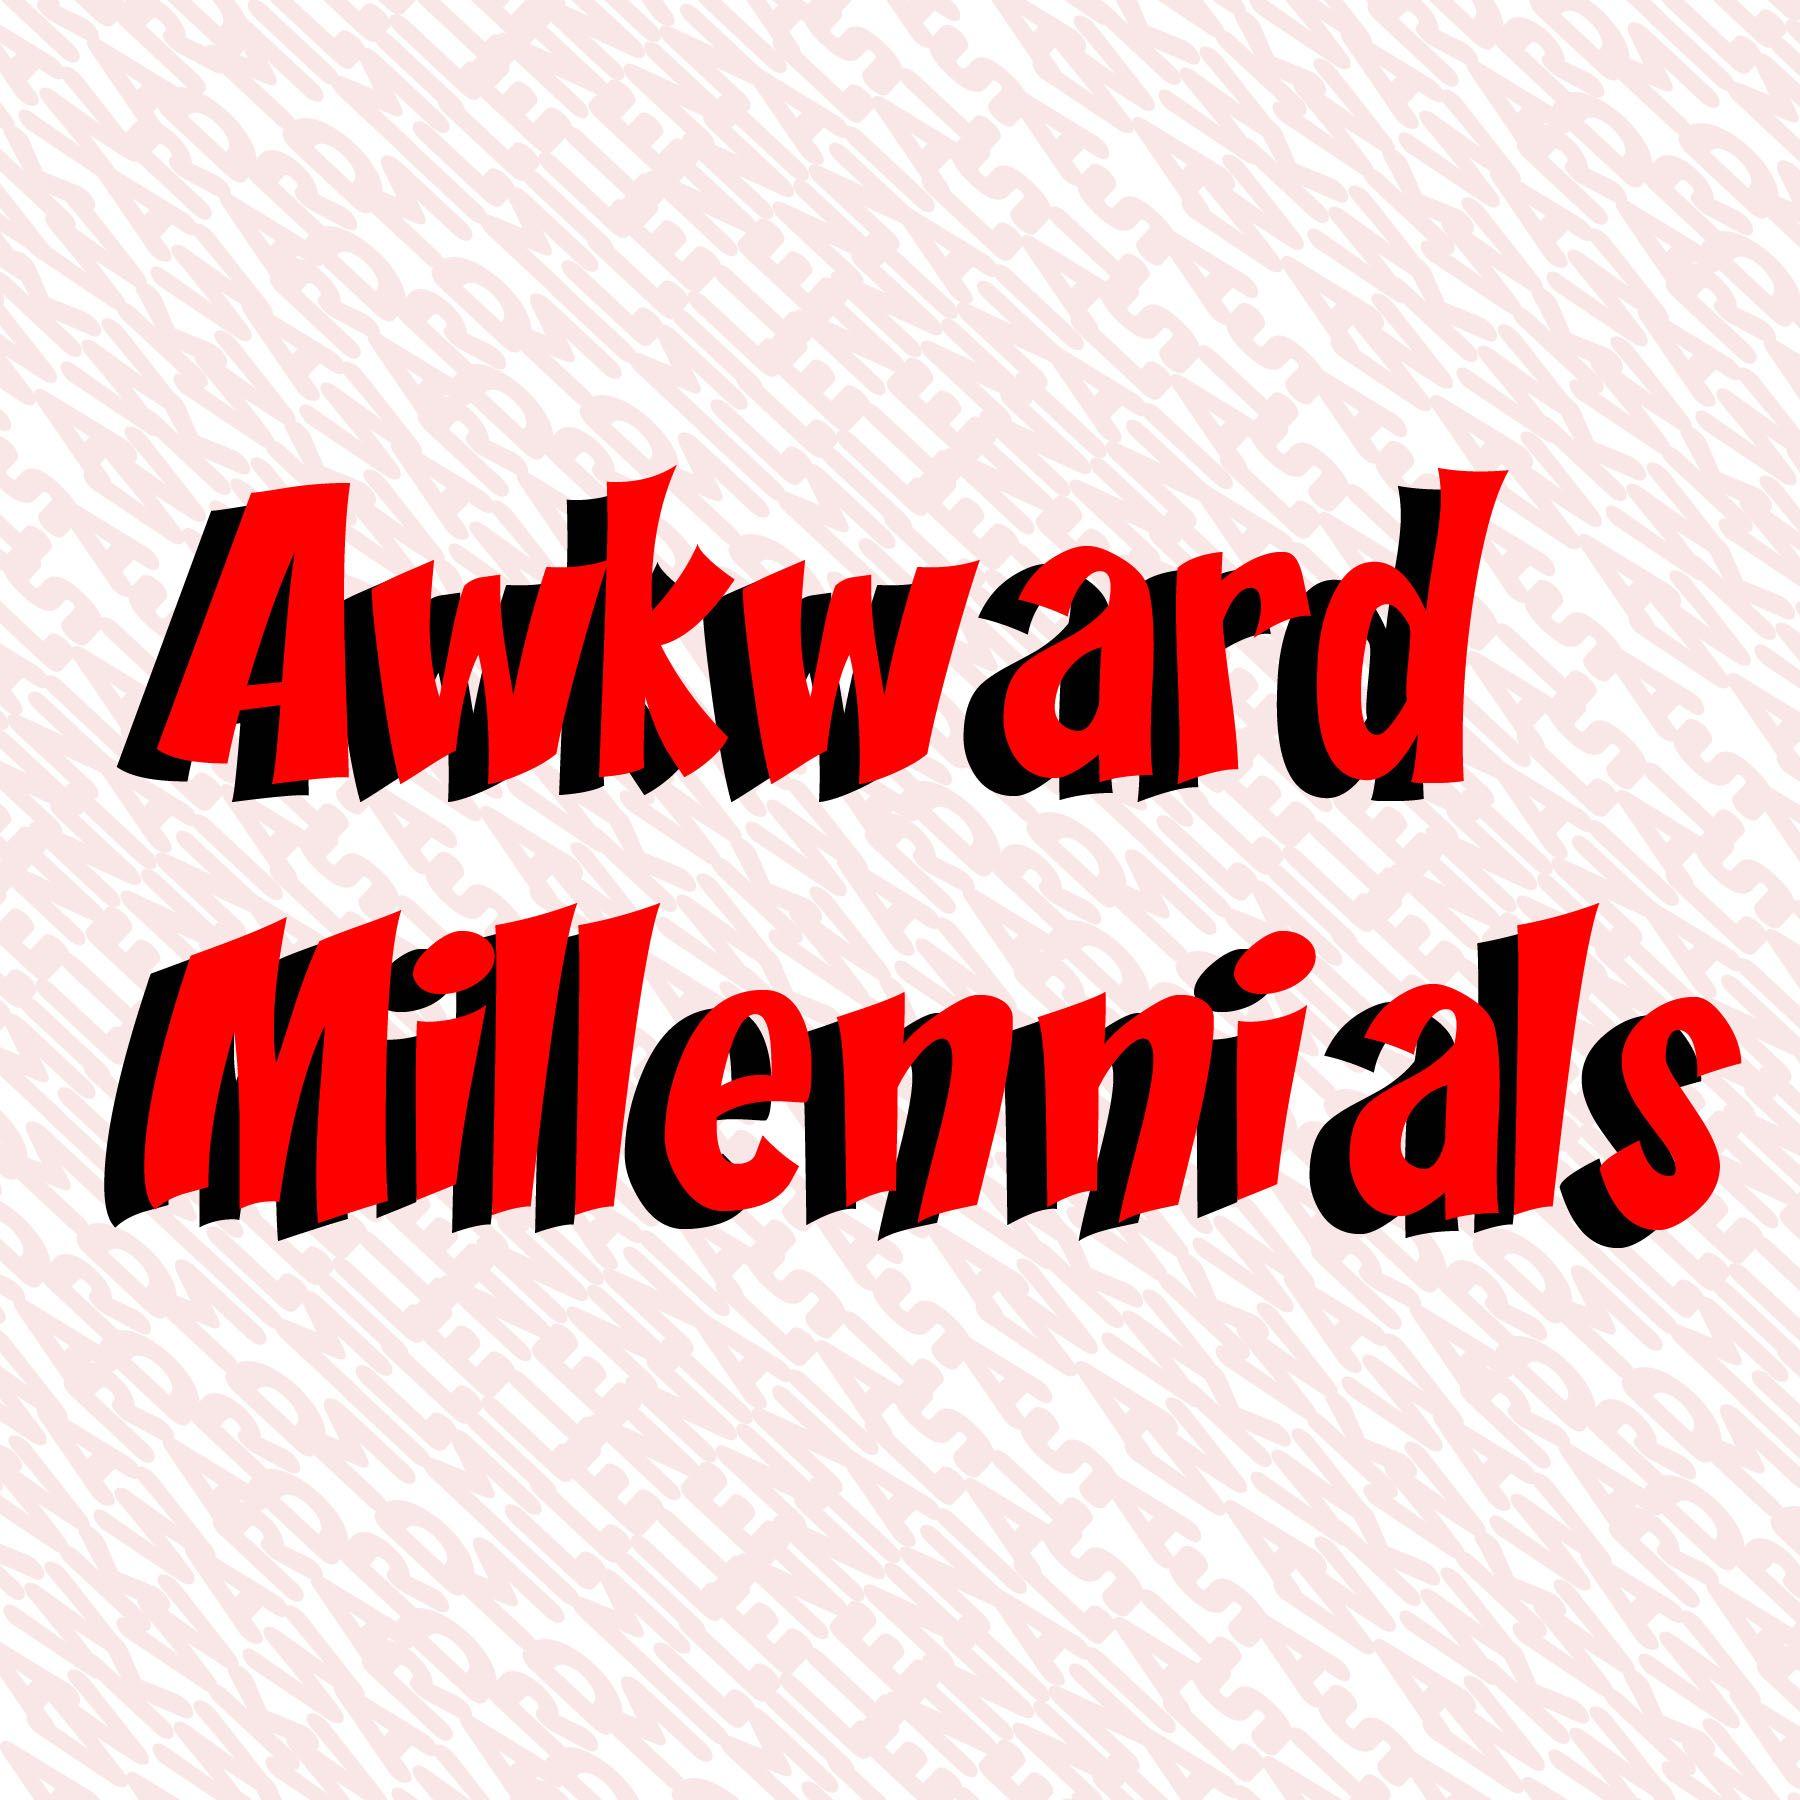 Awkward Millennials - First Contact with $400 Pants